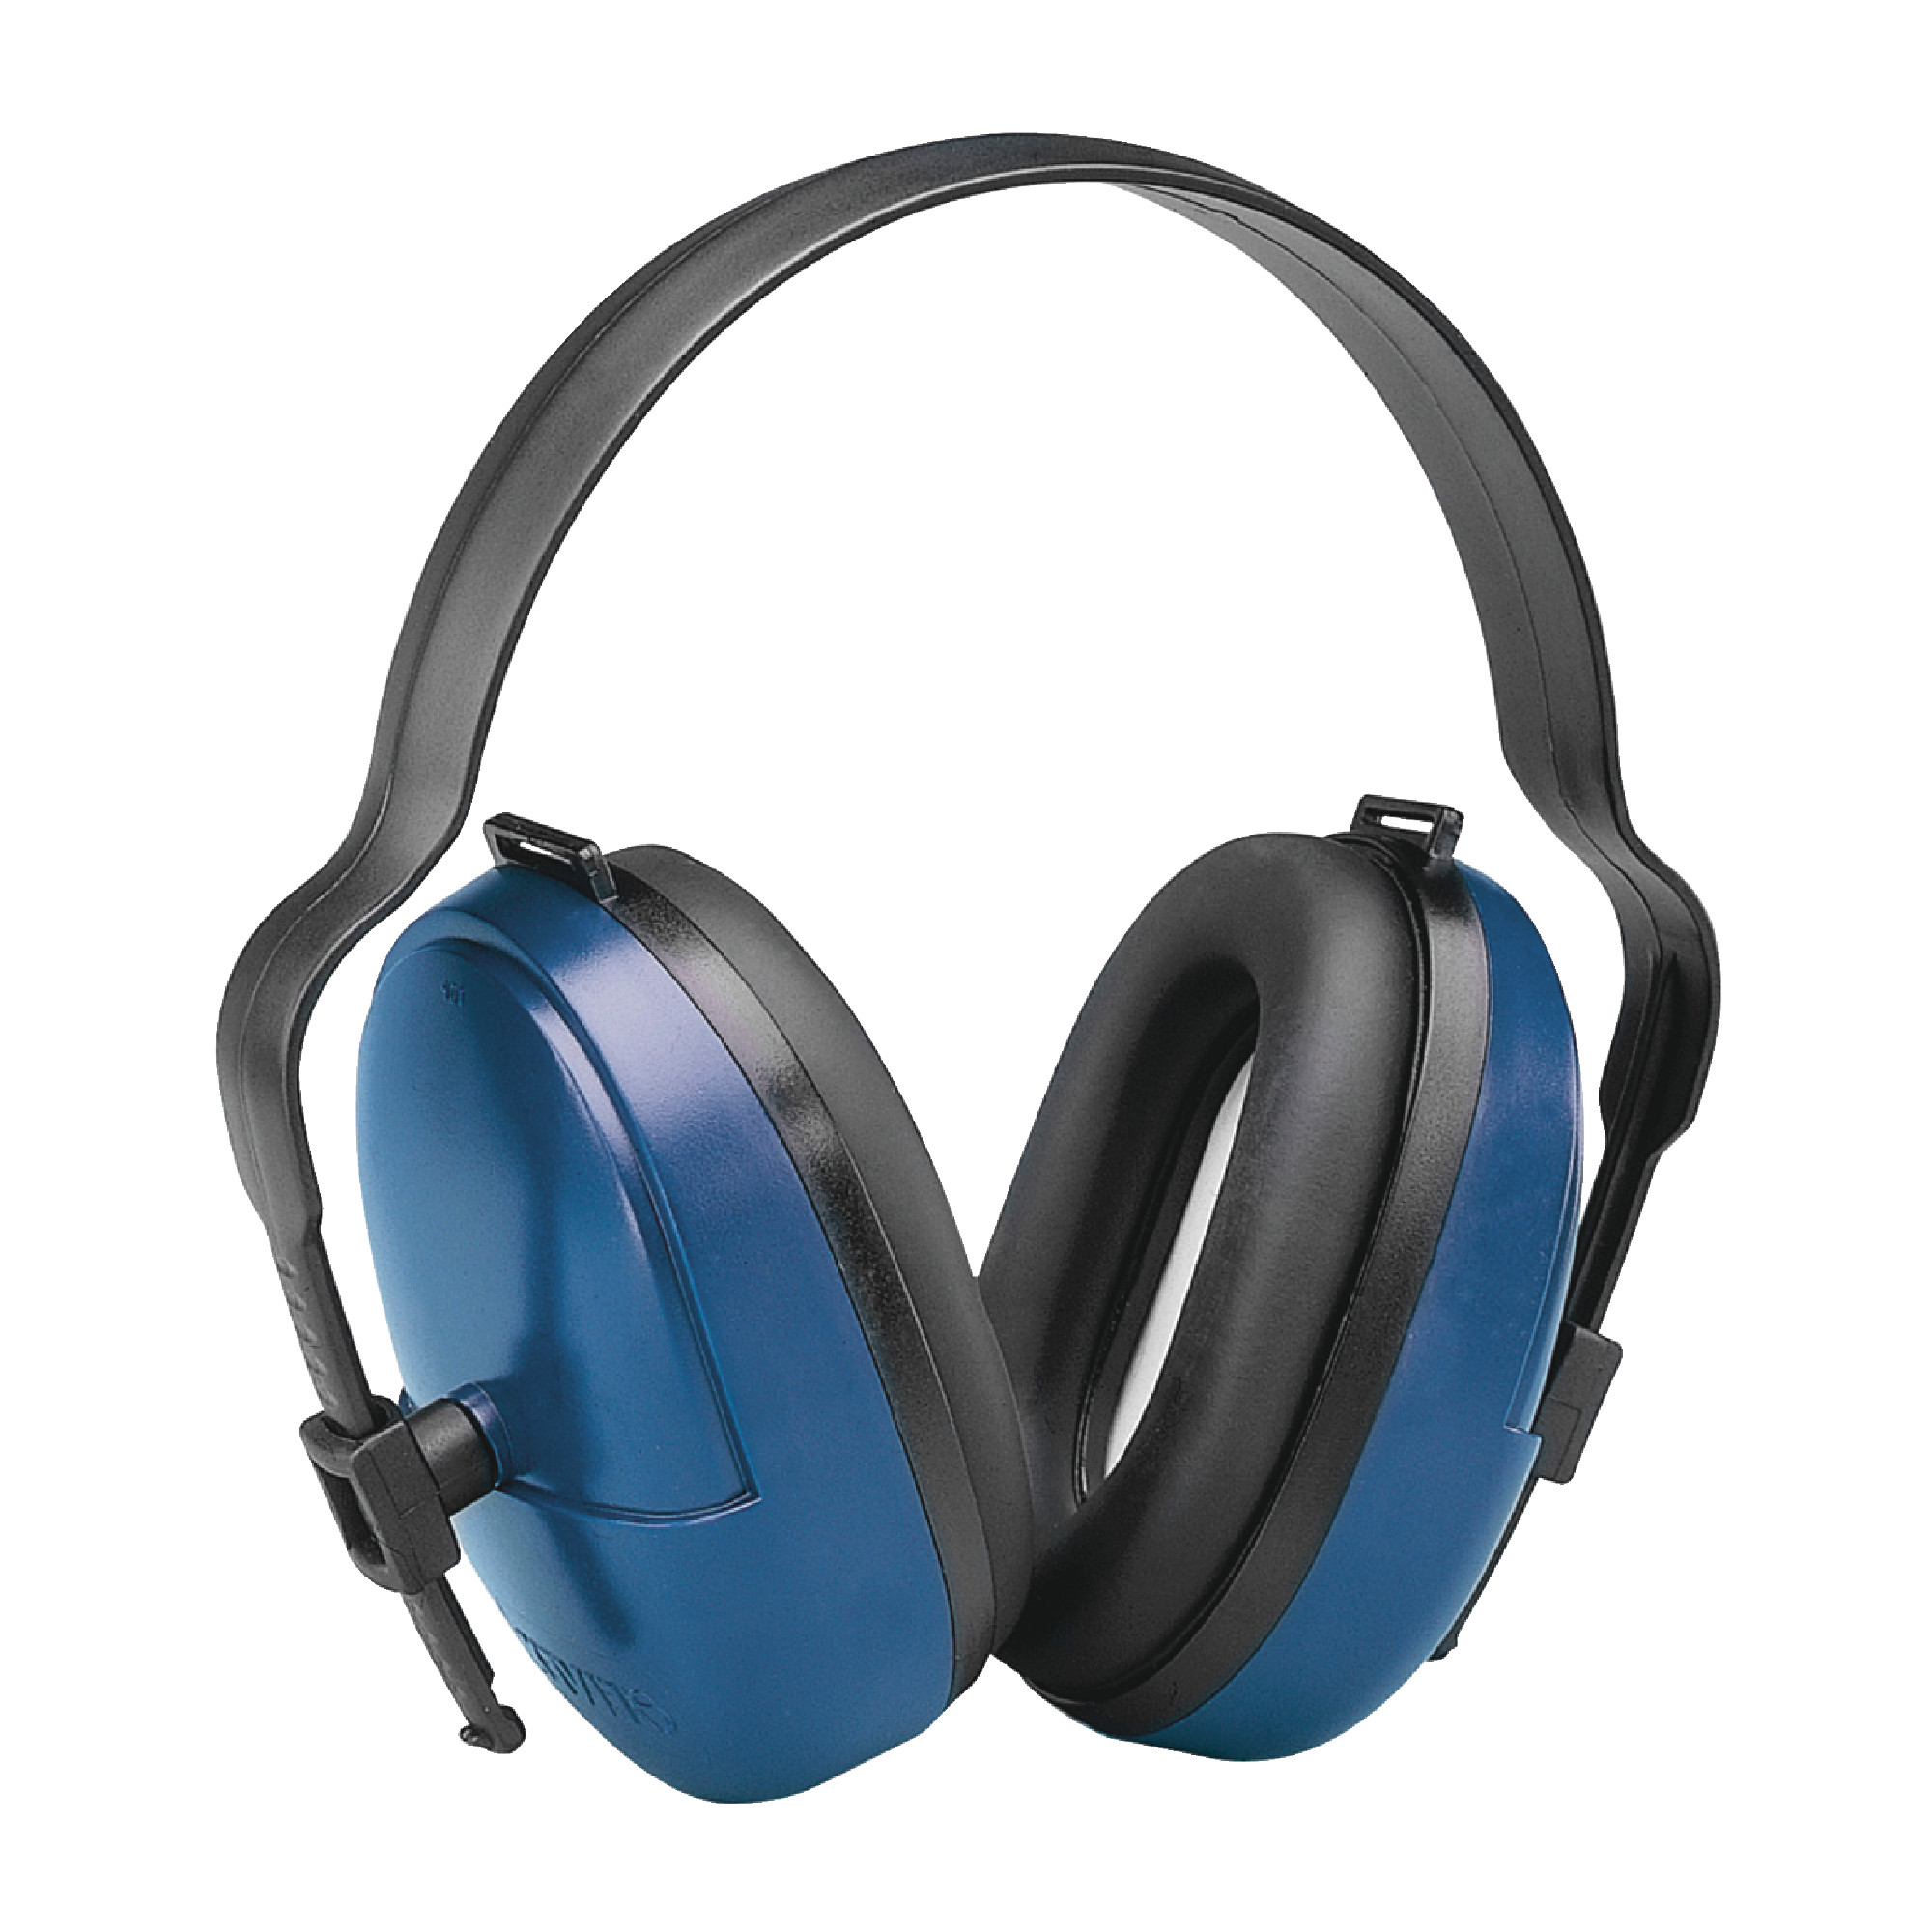 ELVEX Valuemuff Dielectric Multi-Position Ear Muffs